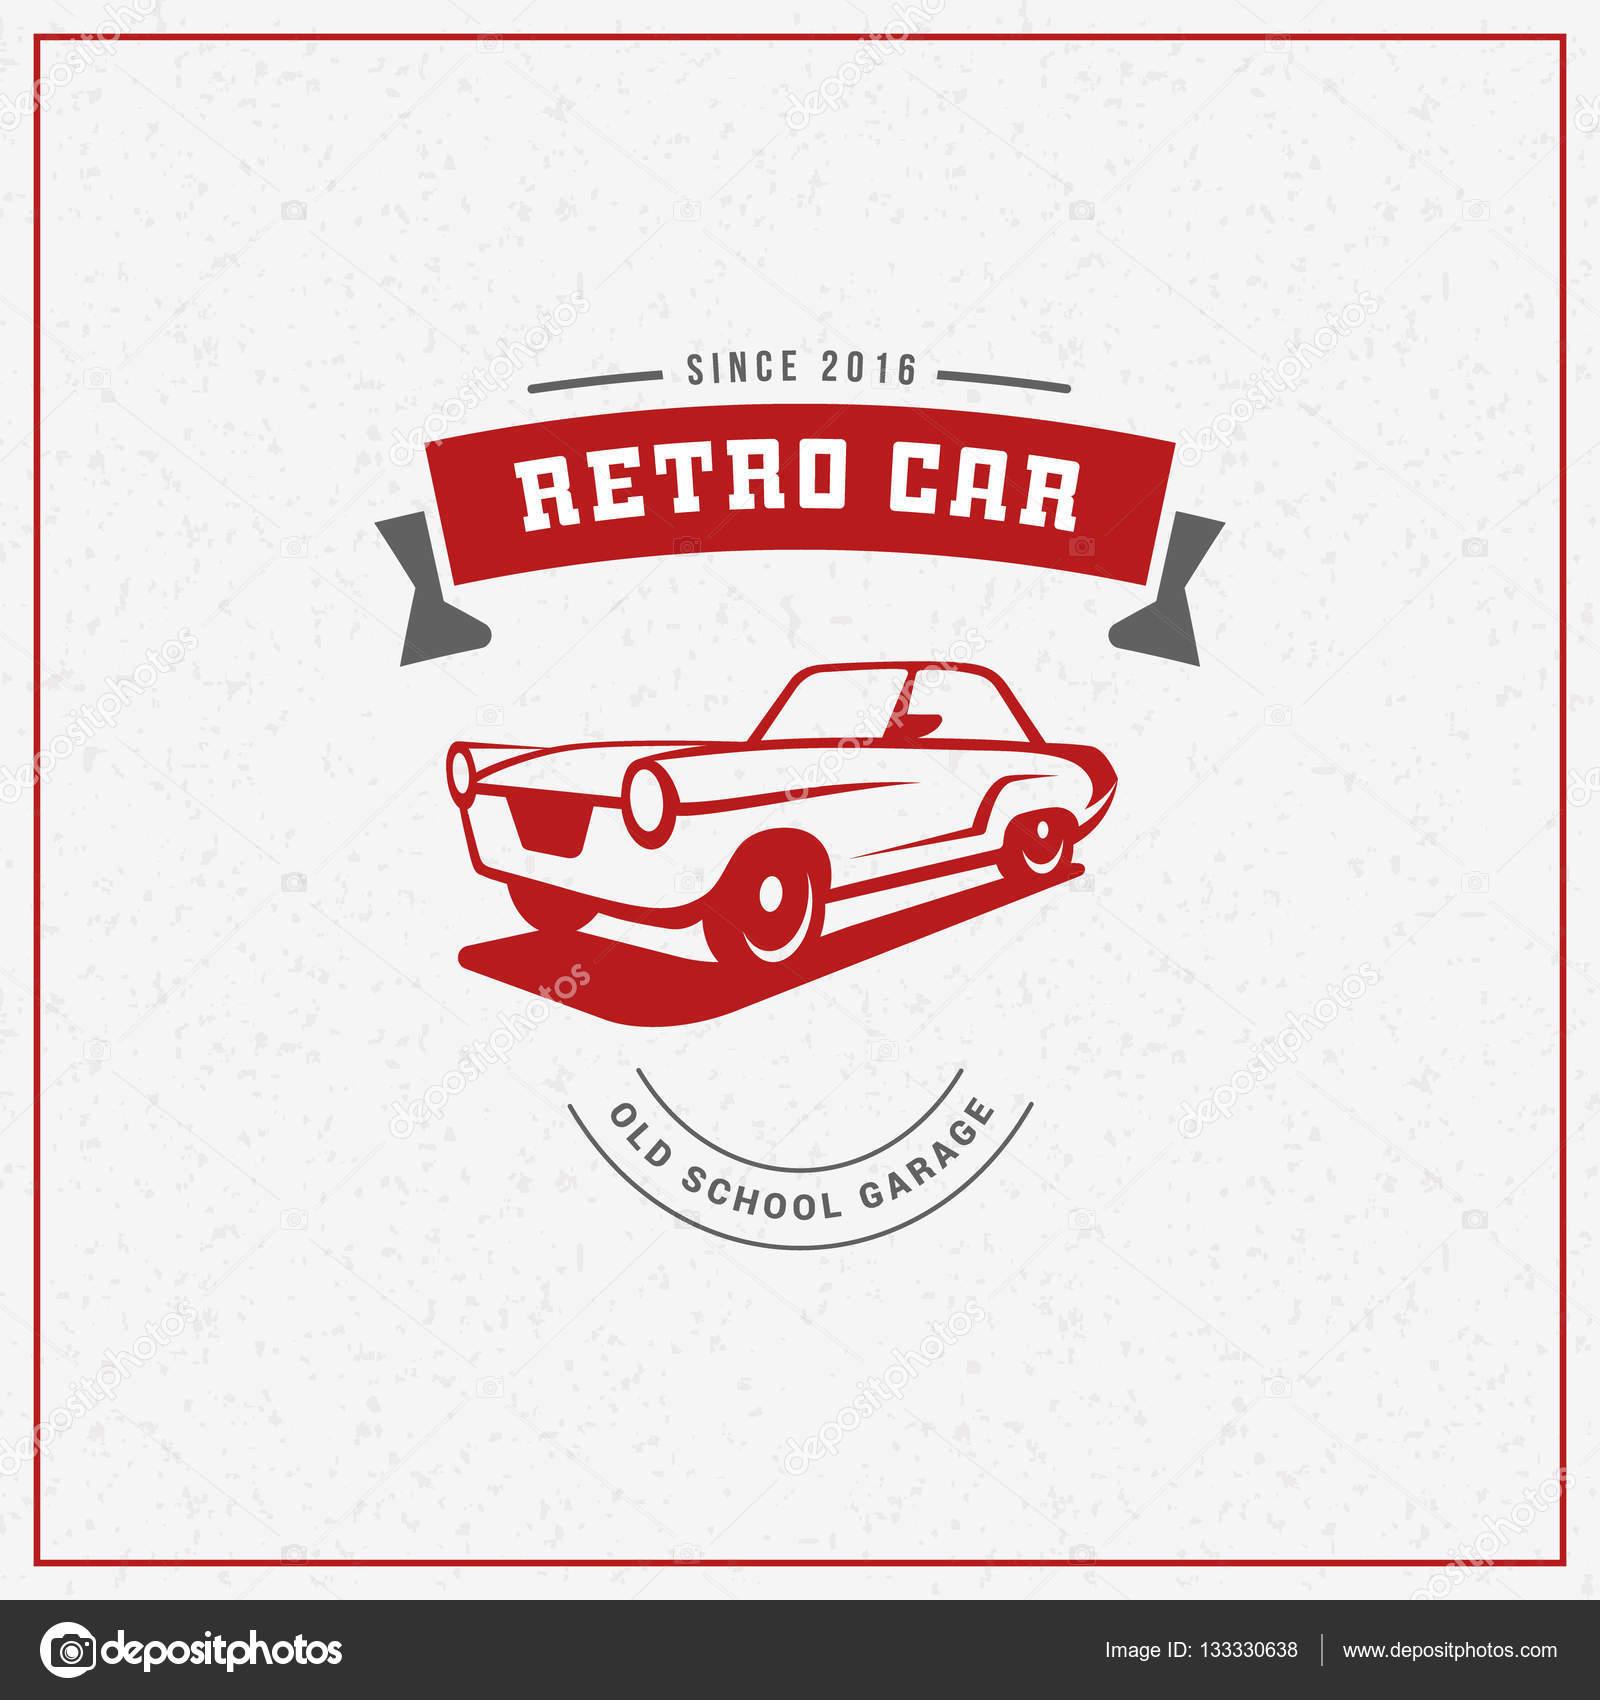 Design car club logo - Classic Car Logo Emblem Badge Service Car Repair Car Restoration And Car Club Design Elements Vector Illustration Red And Gray On Light Background